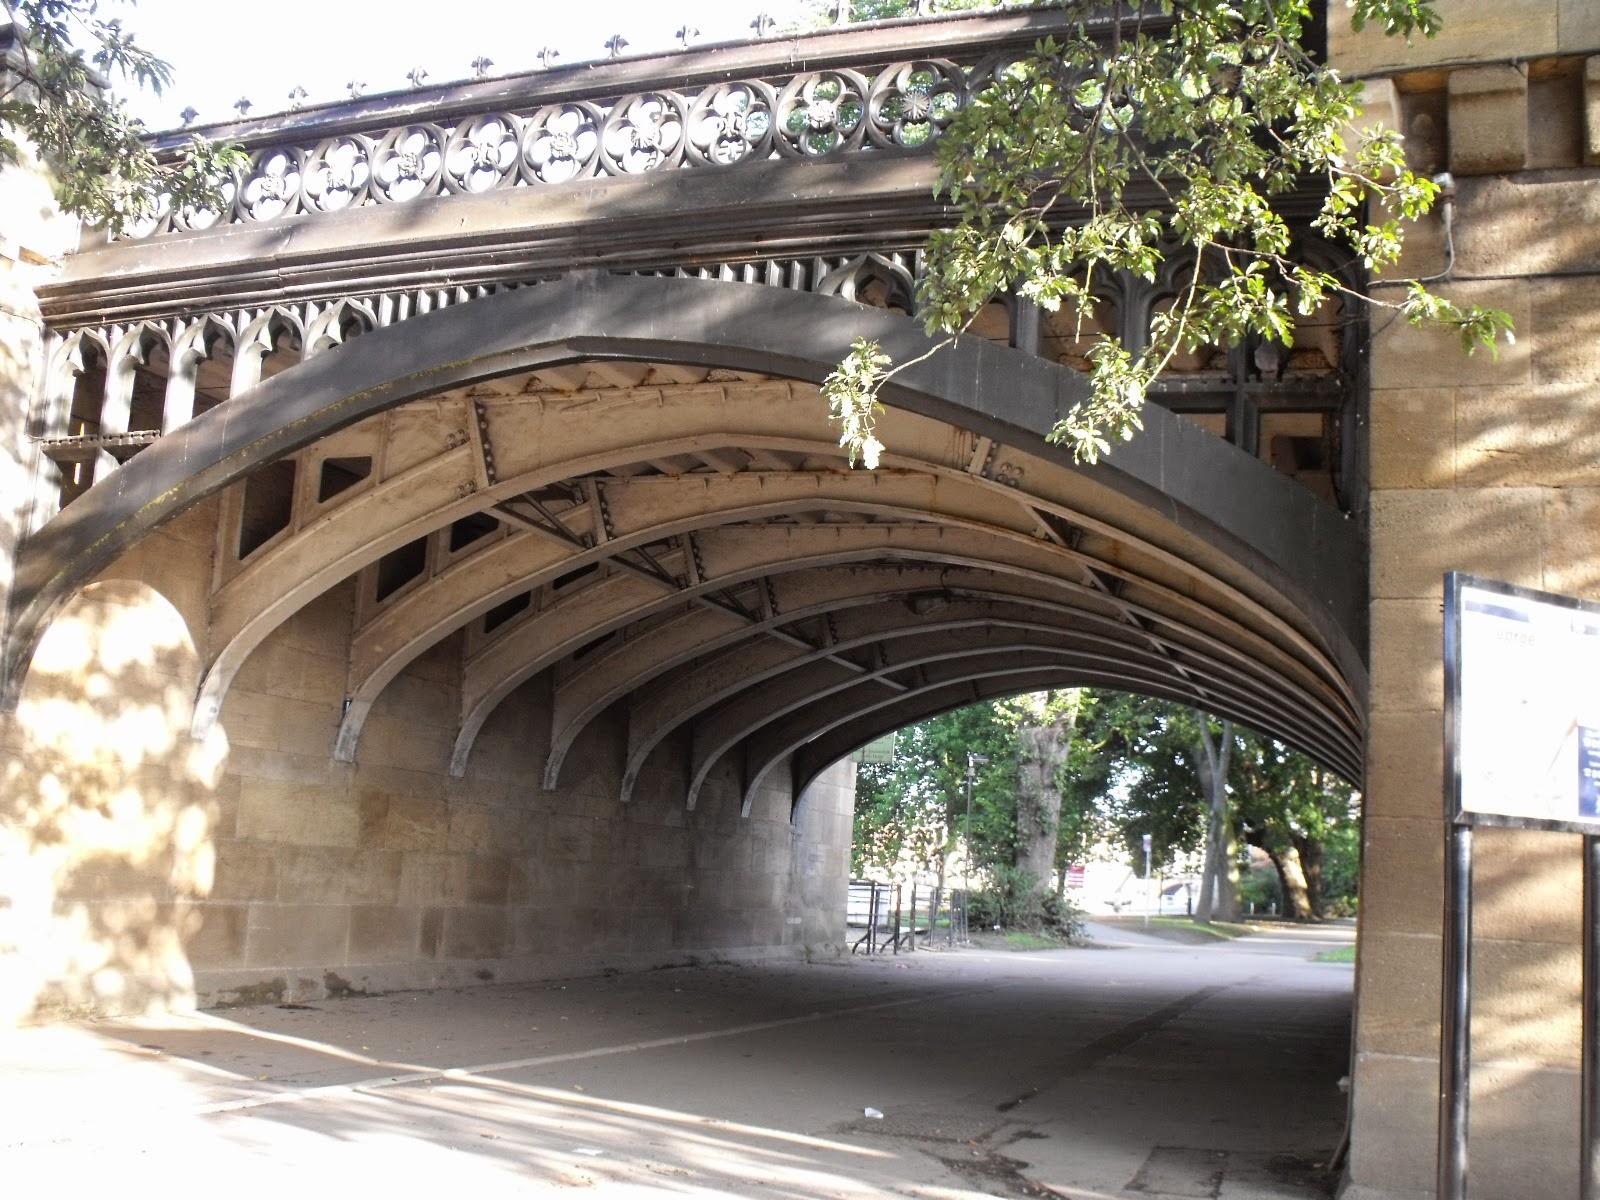 http://www.historyofyork.org.uk/themes/victorian/skeldergate-bridge